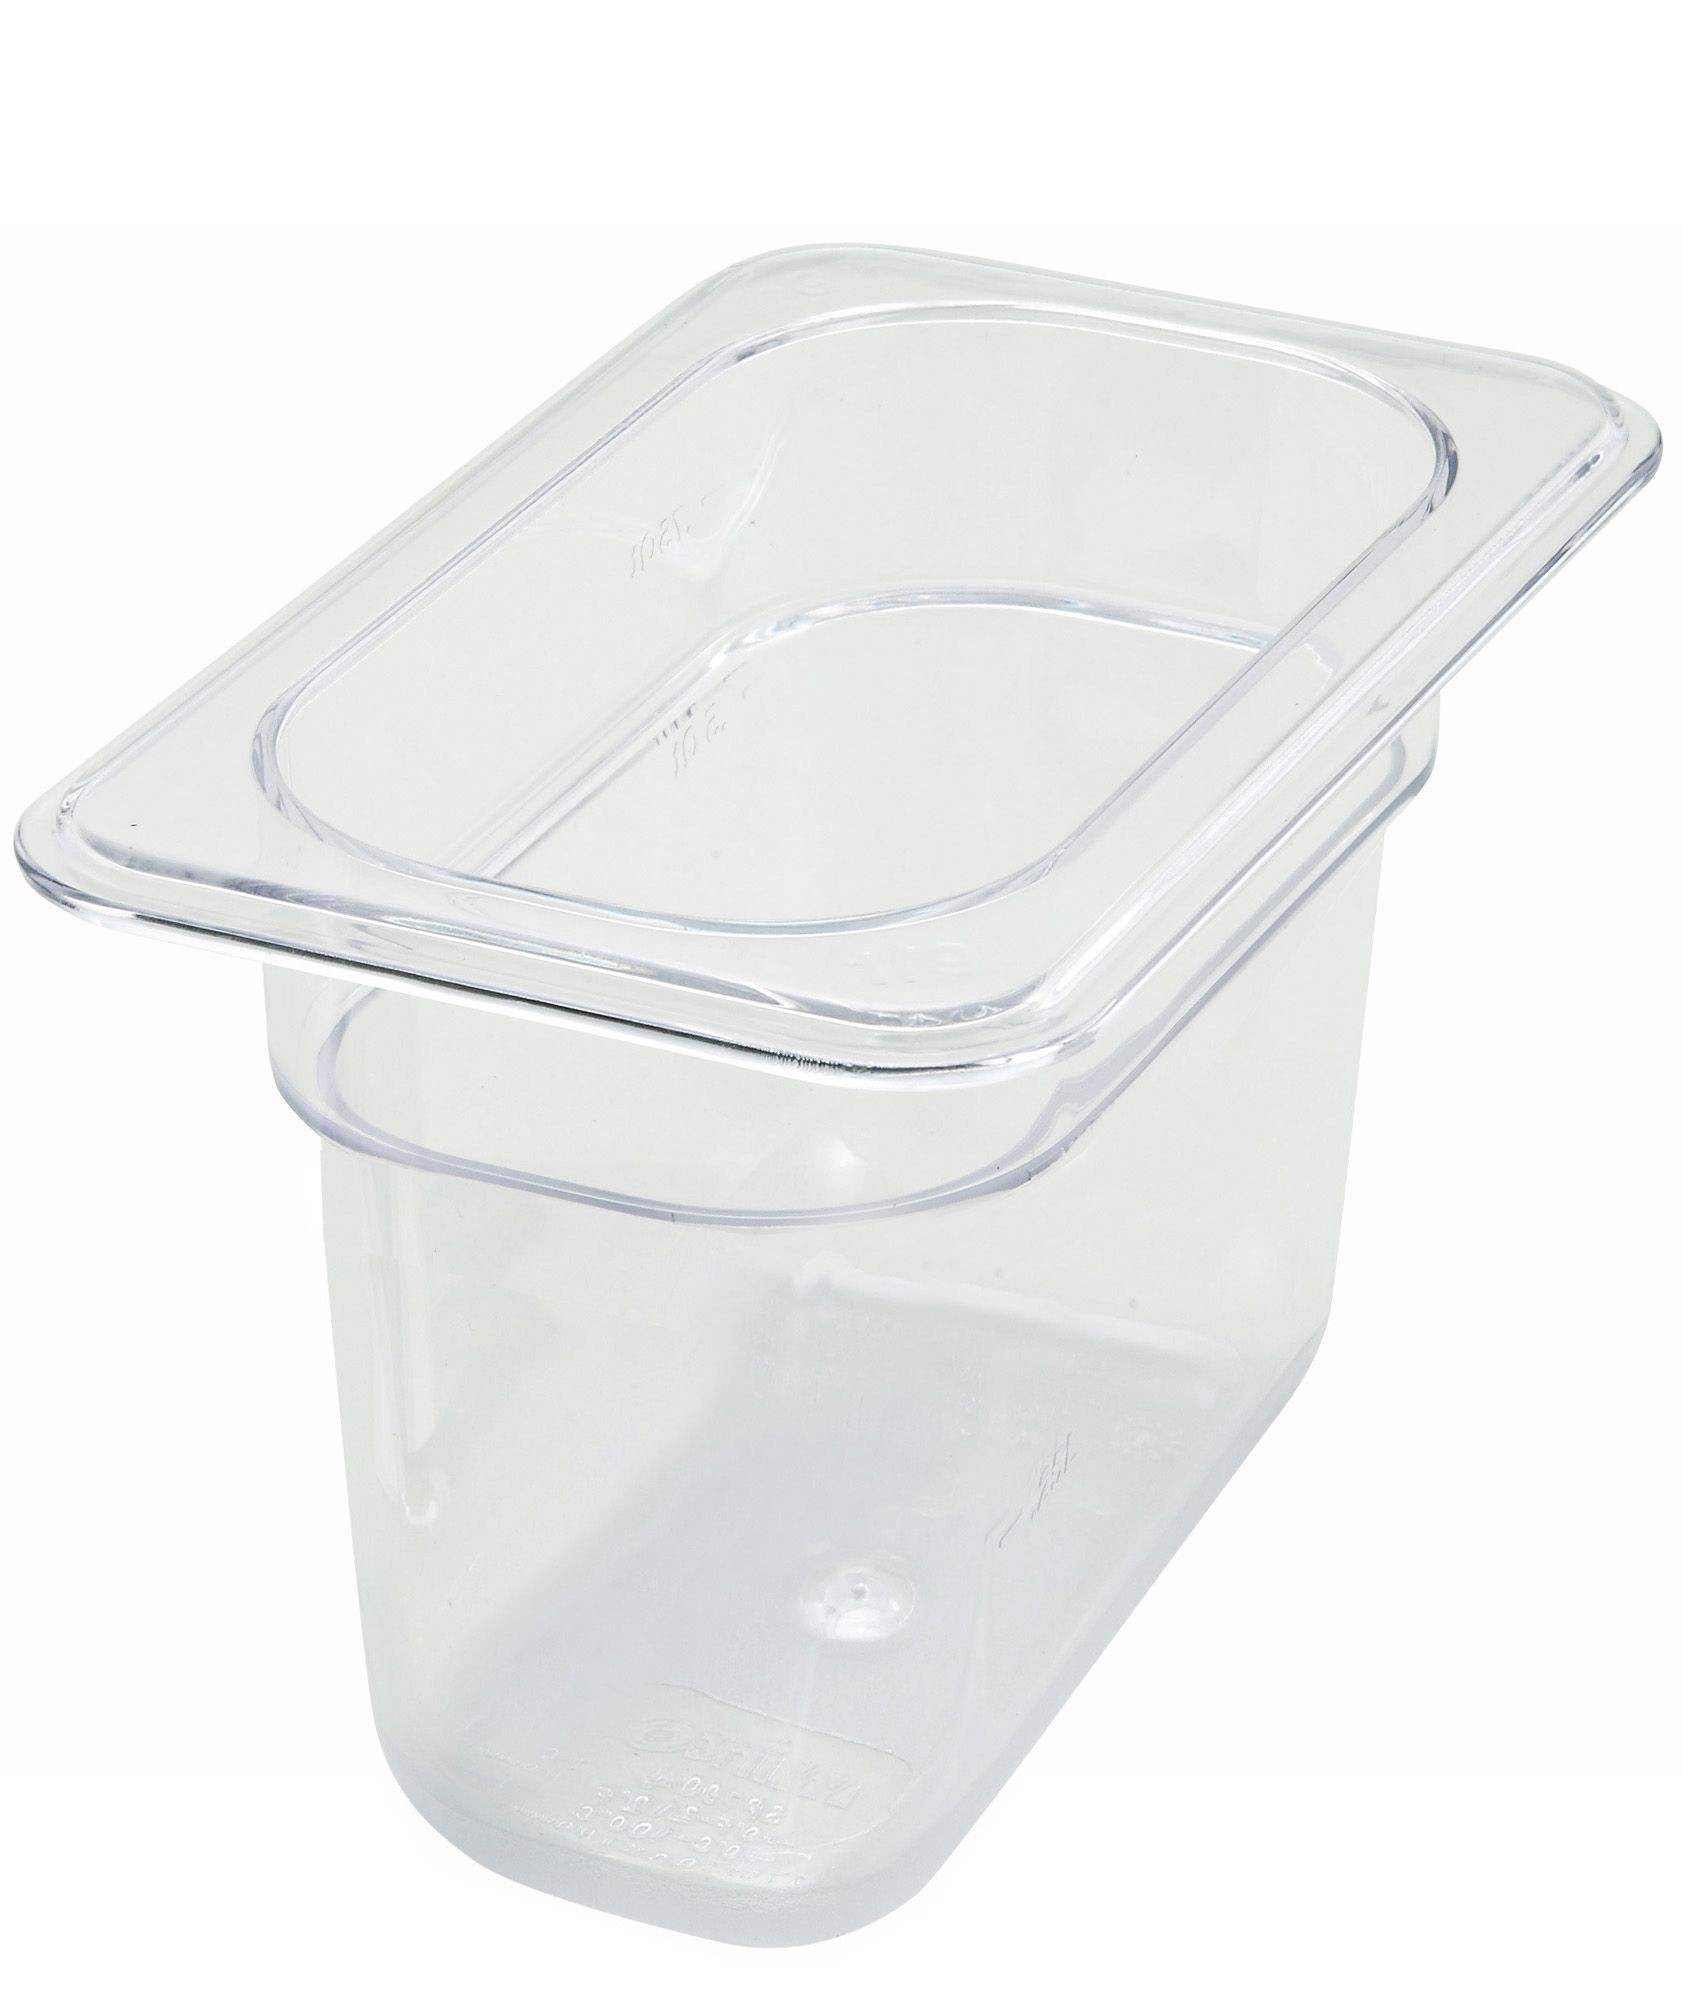 "Winco SP7906 Ninth Size Polycarbonate Food Pan, 6"" Deep"